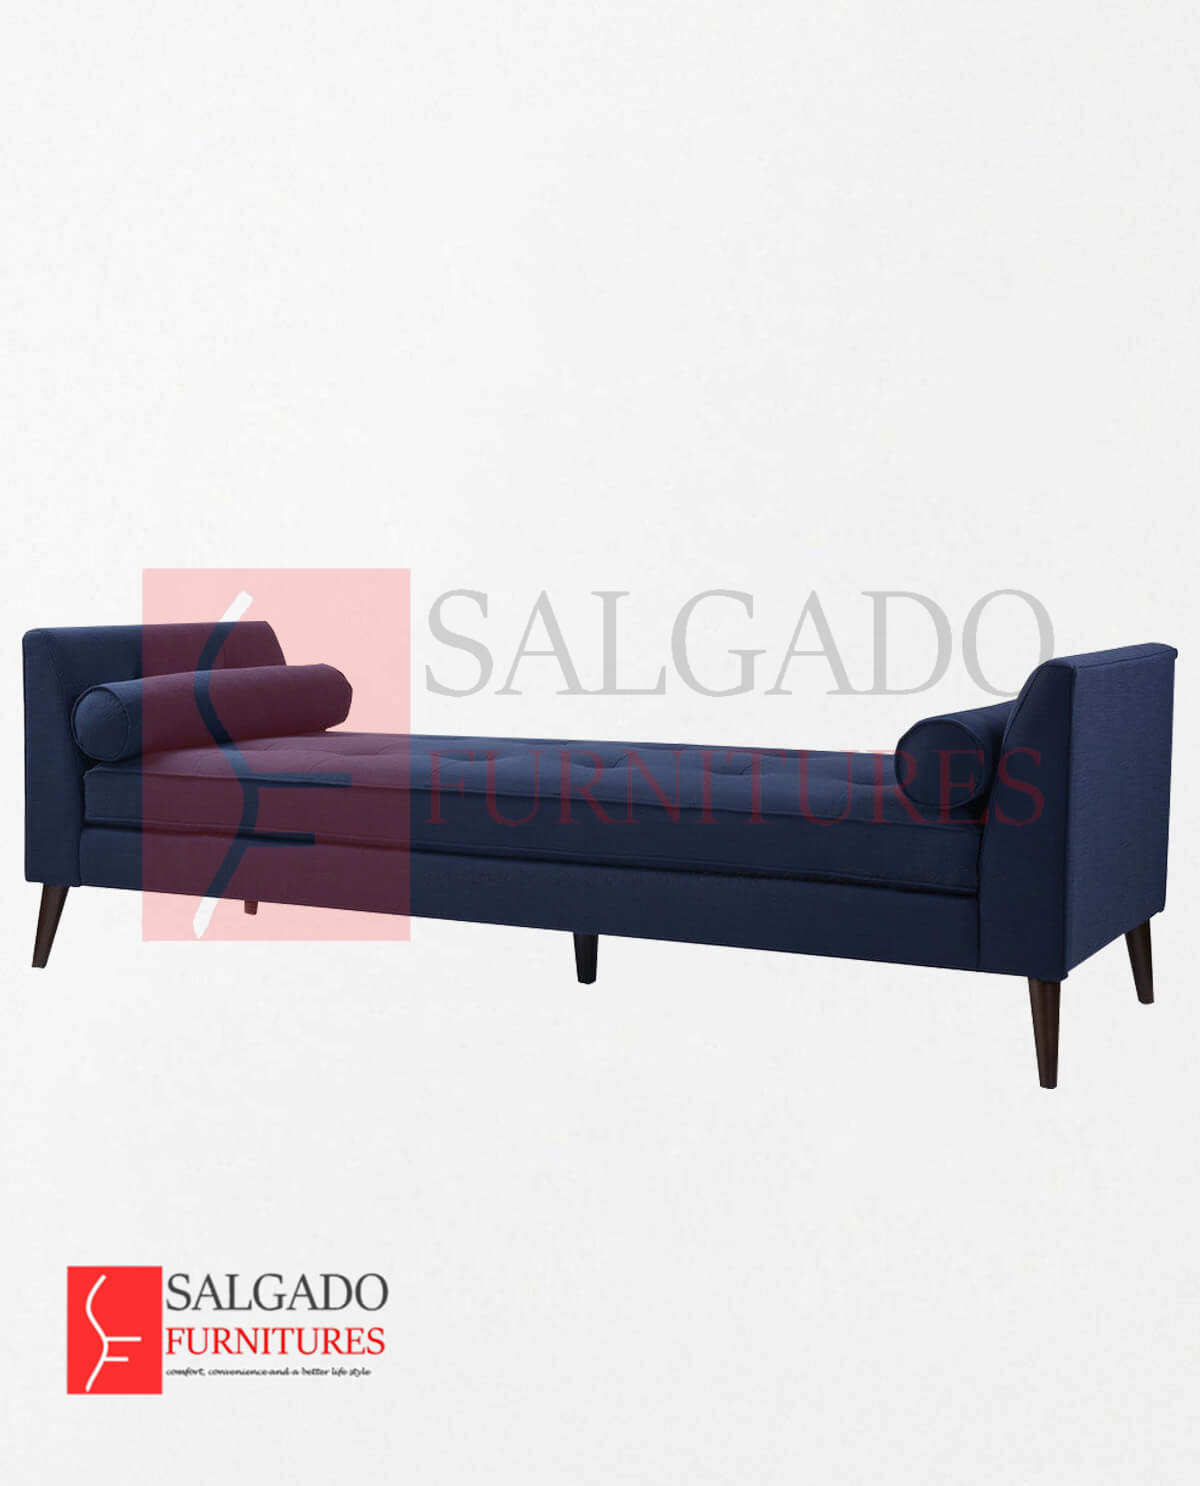 sofa-bed-sri lanka